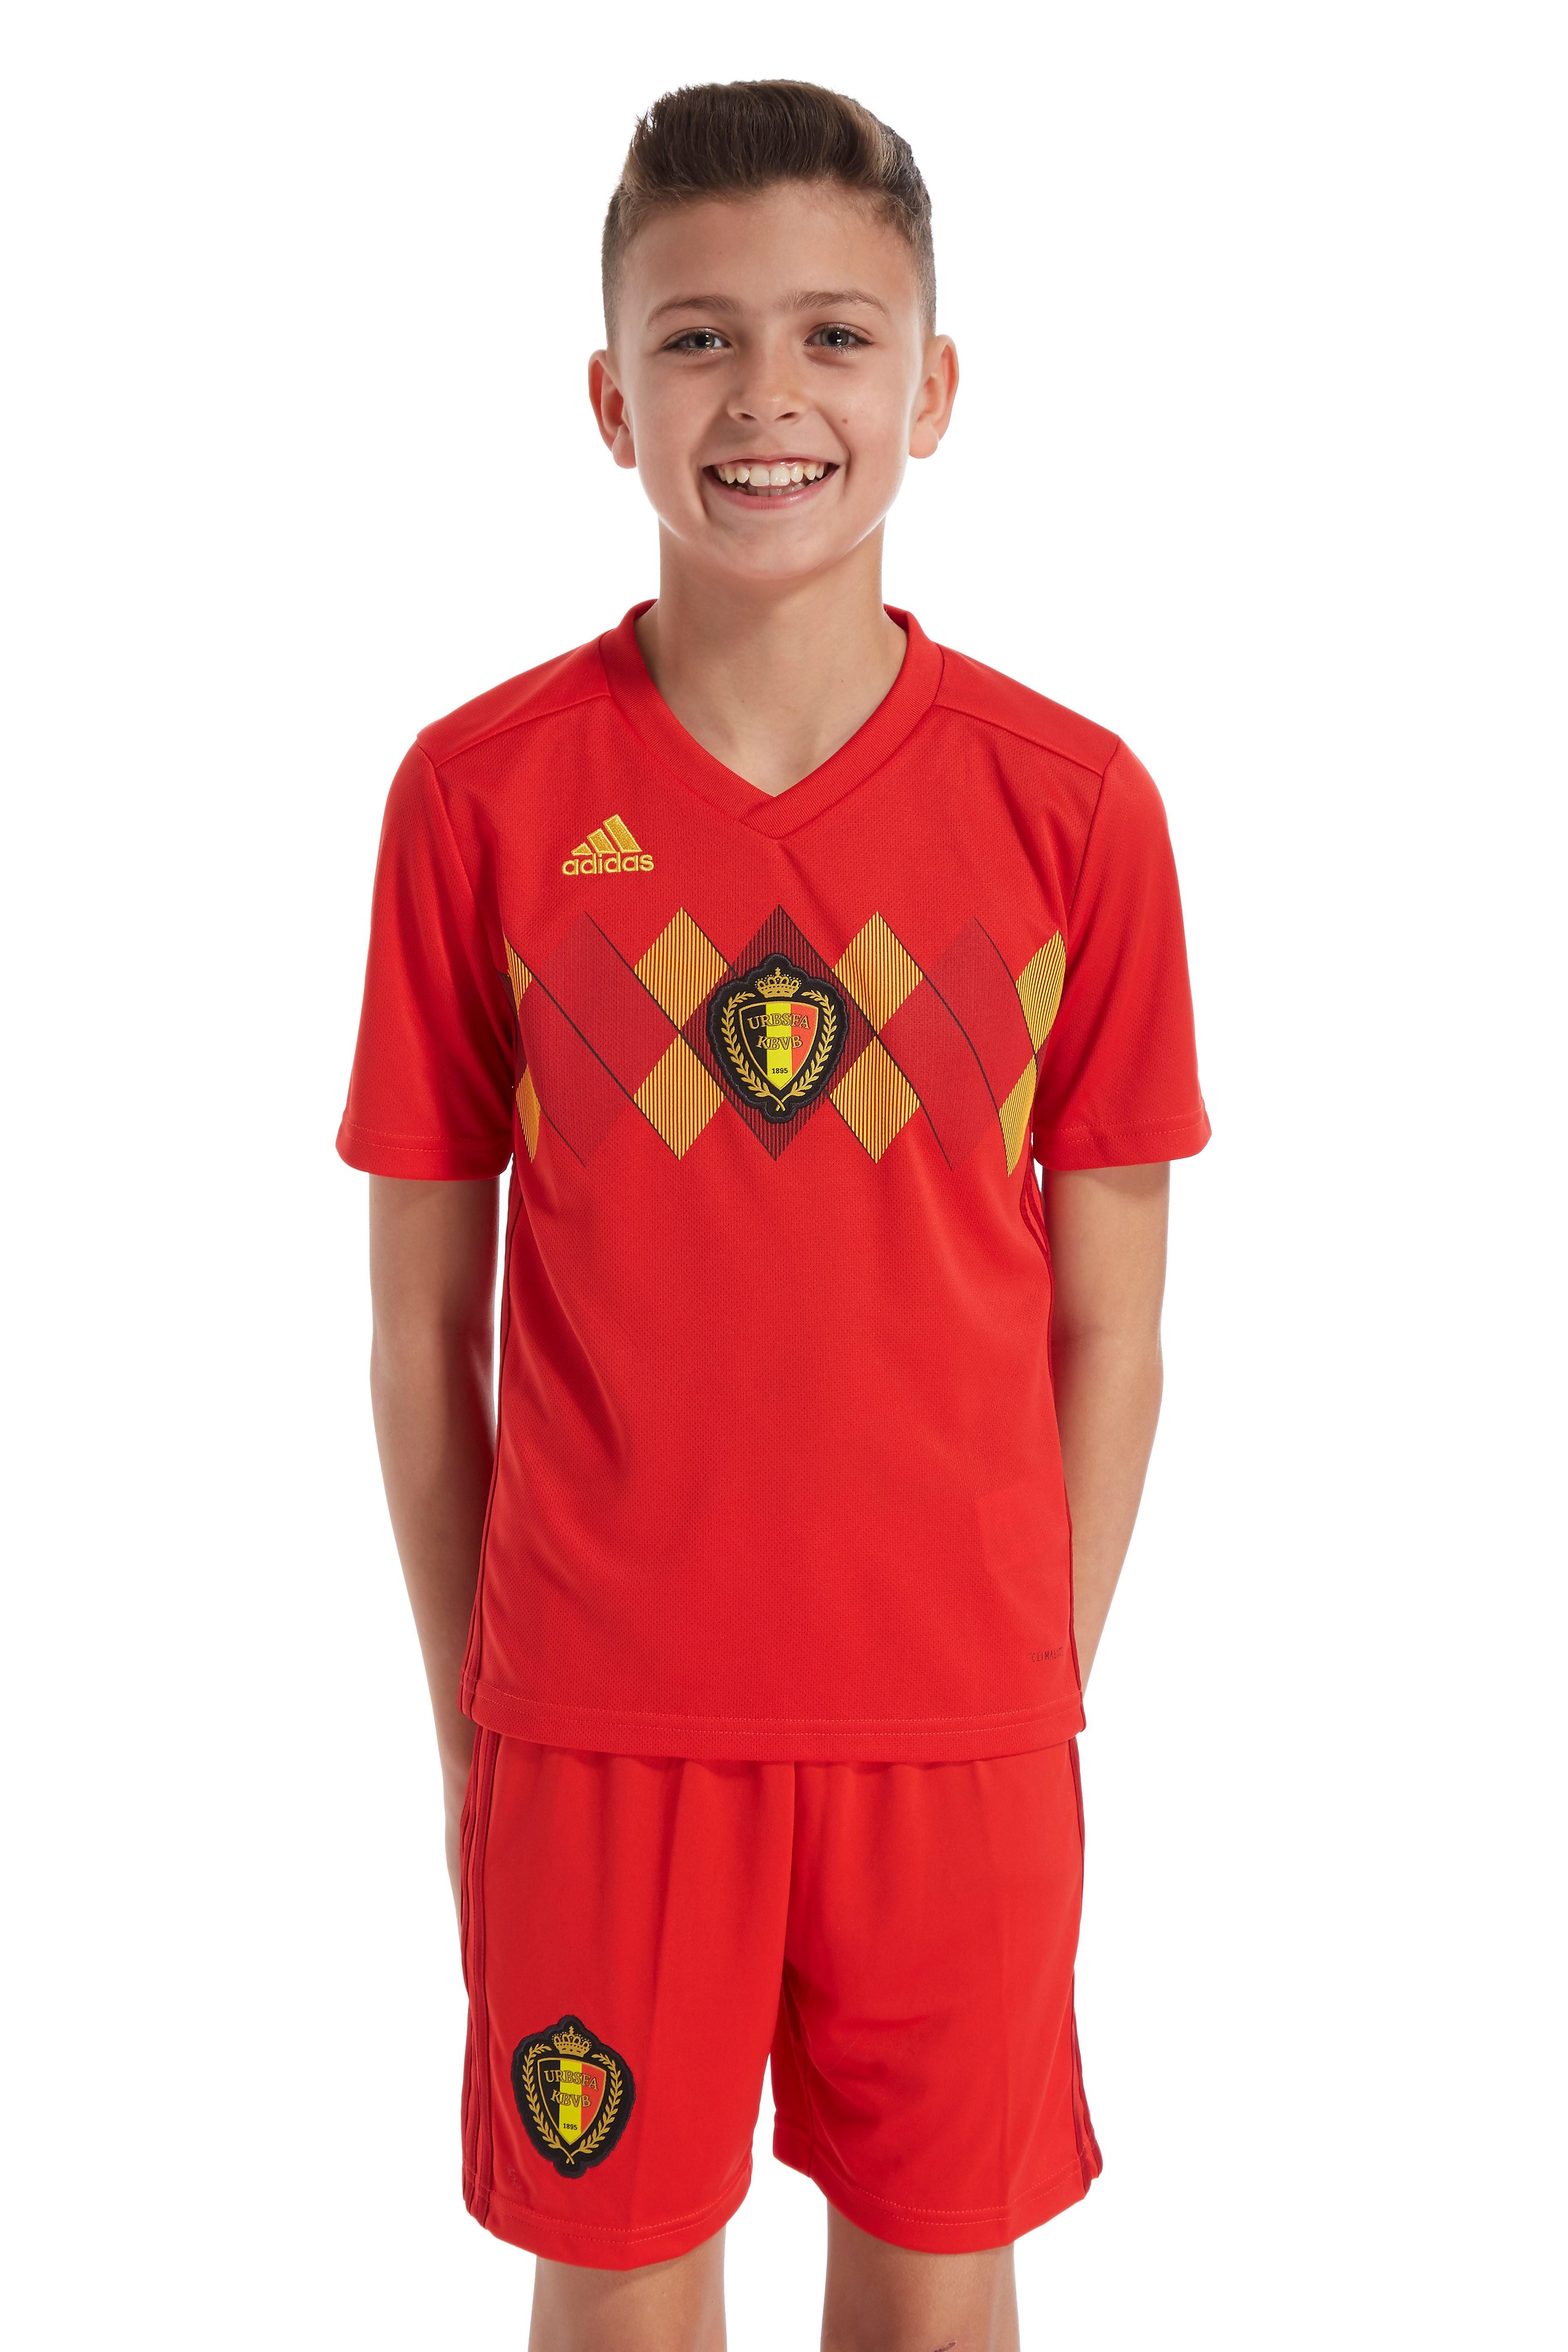 adidas Belgium 2017/18 Home Jersey Junior Rood Kind